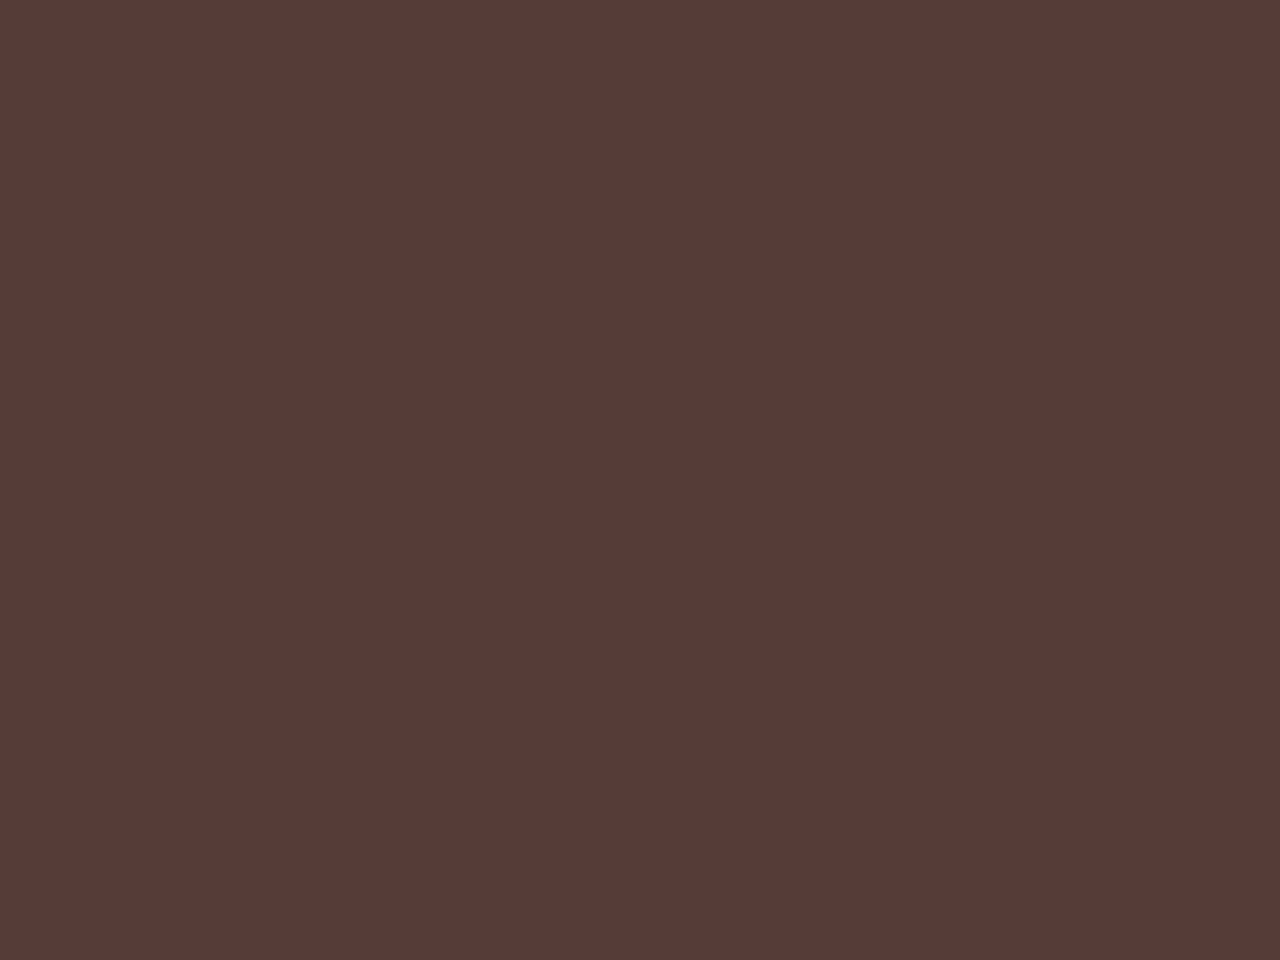 1280x960 Dark Liver Horses Solid Color Background